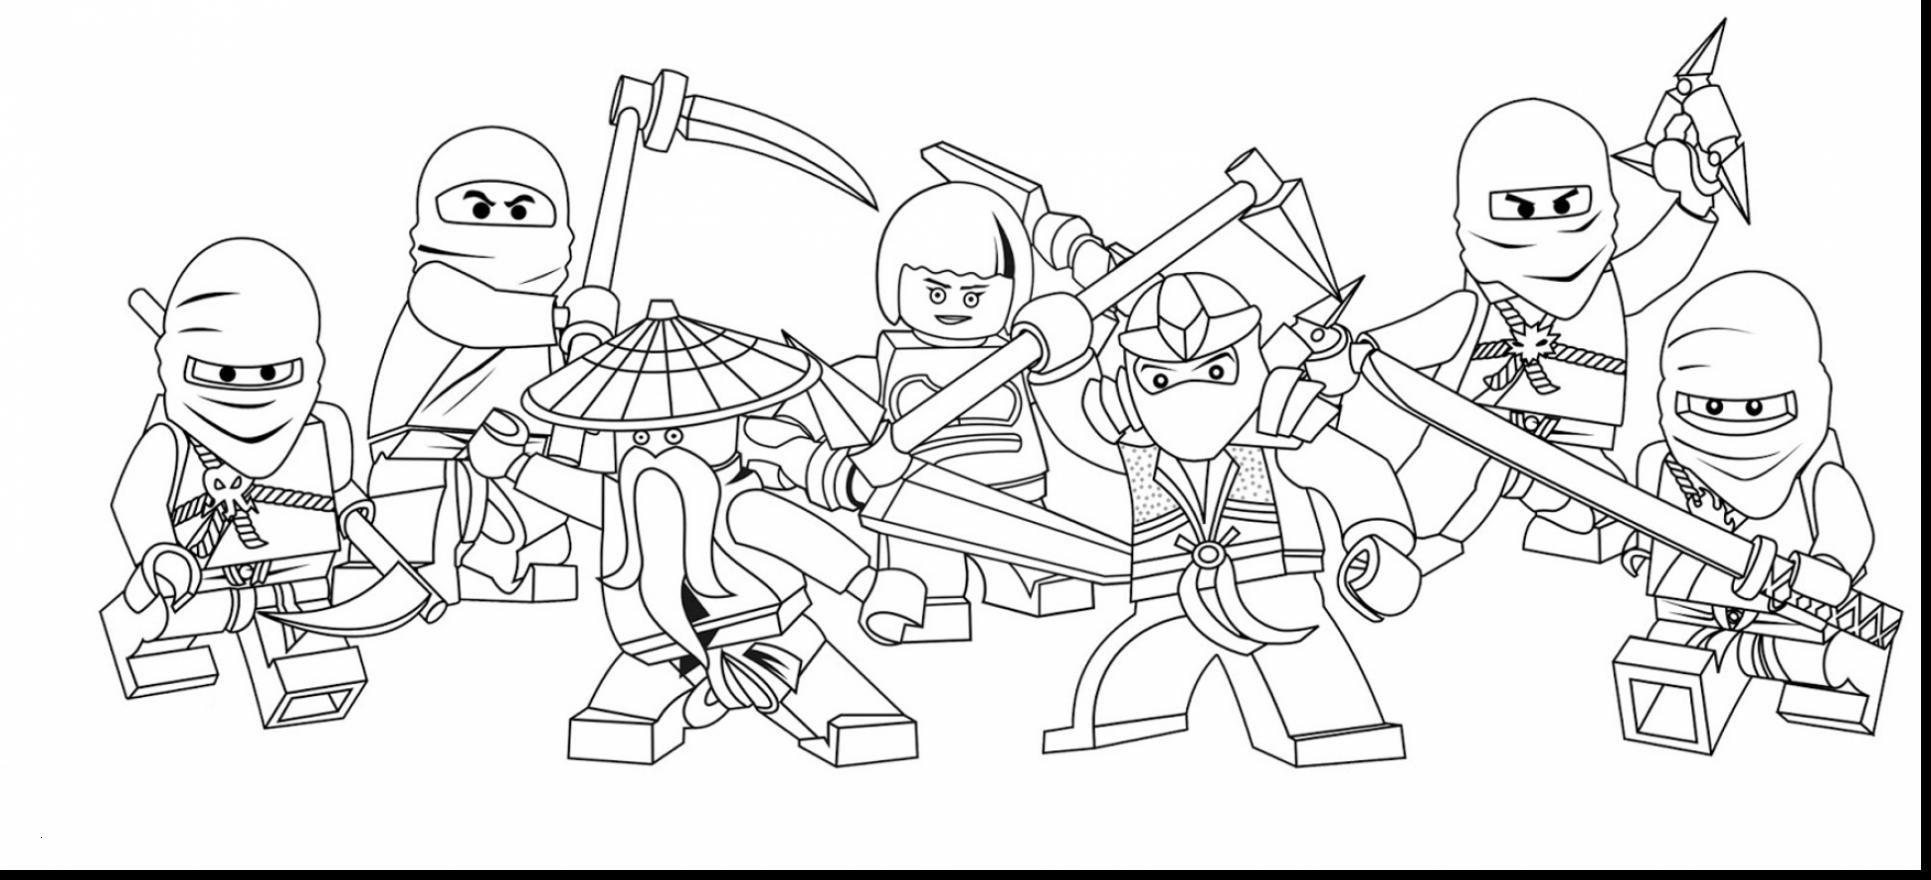 Ninjago Ausmalbilder Jay Genial Lego Ausmalbilder Ninjago Uploadertalk Frisch Ninjago Ausmalbilder Bild